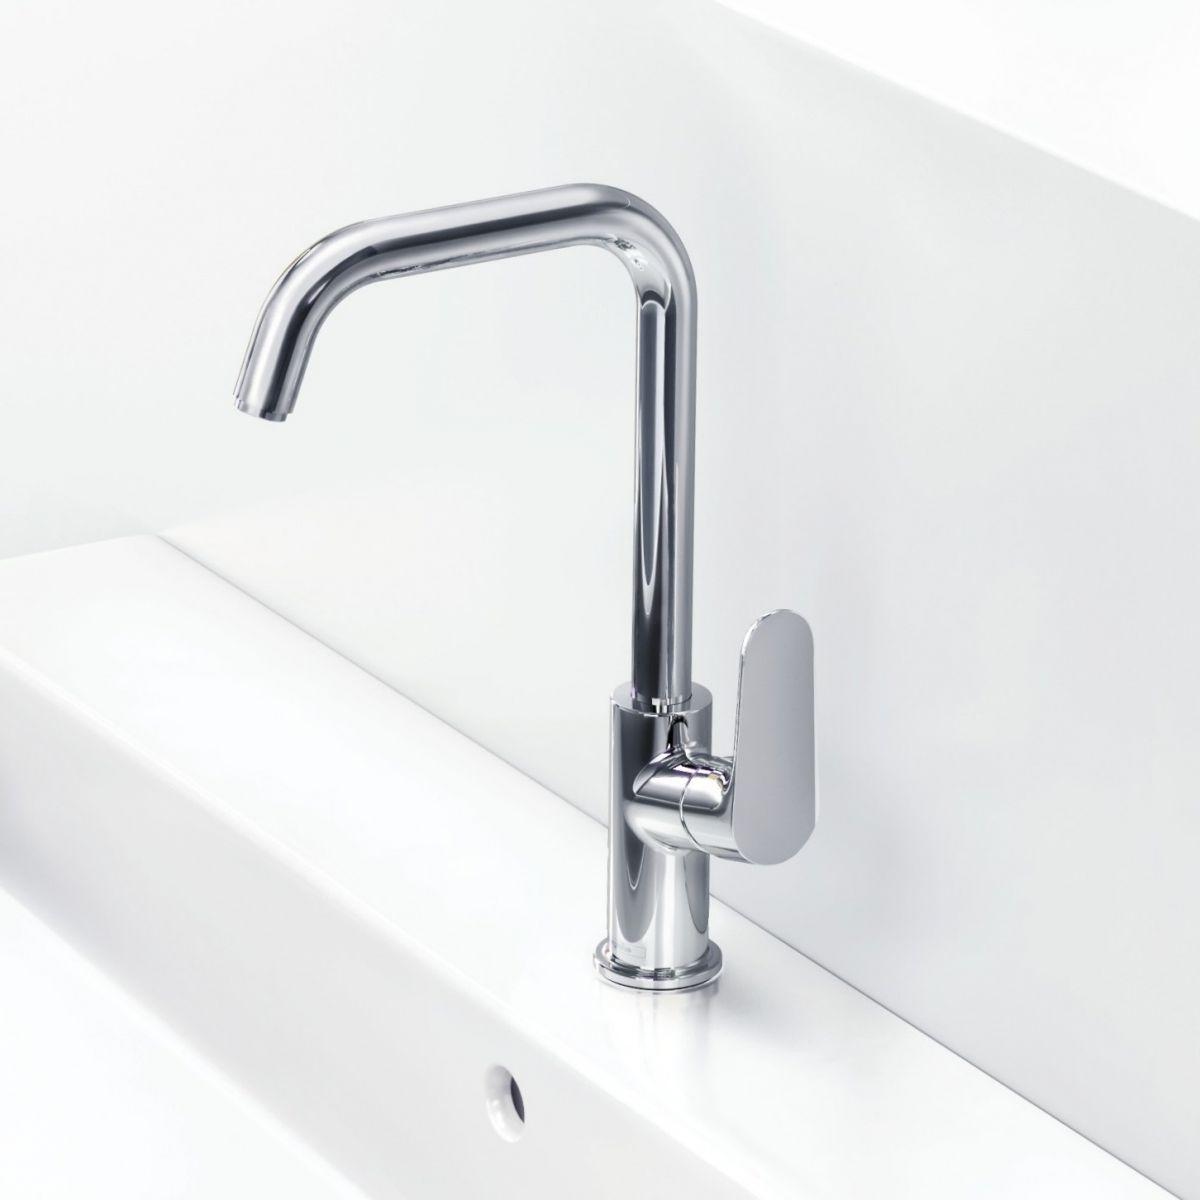 Hansgrohe Focus 240 Swivel Spout Basin Tap : UK Bathrooms